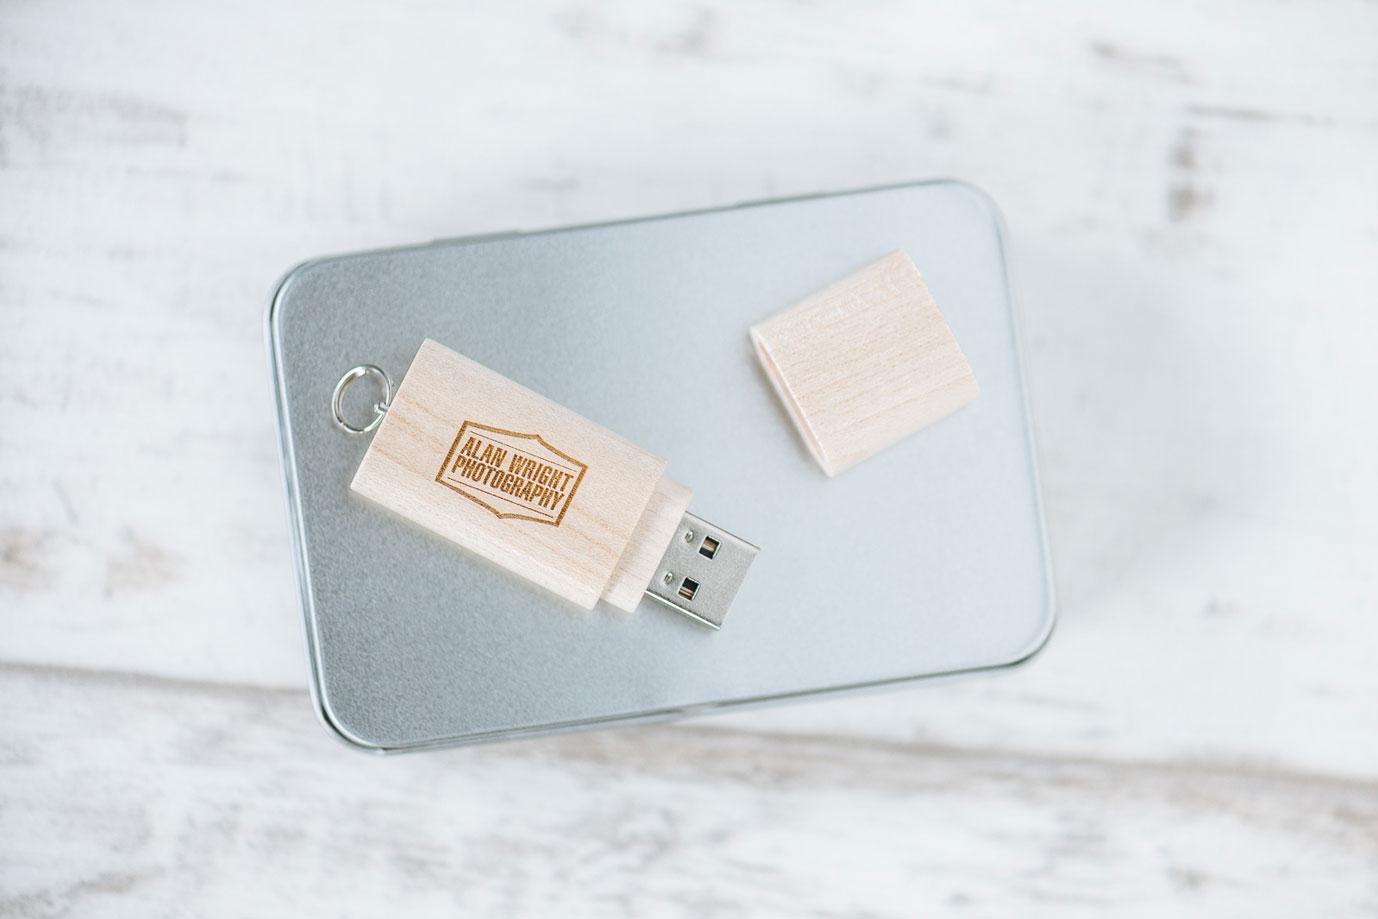 Brand New USB Memory Sticks – Farewell CD's